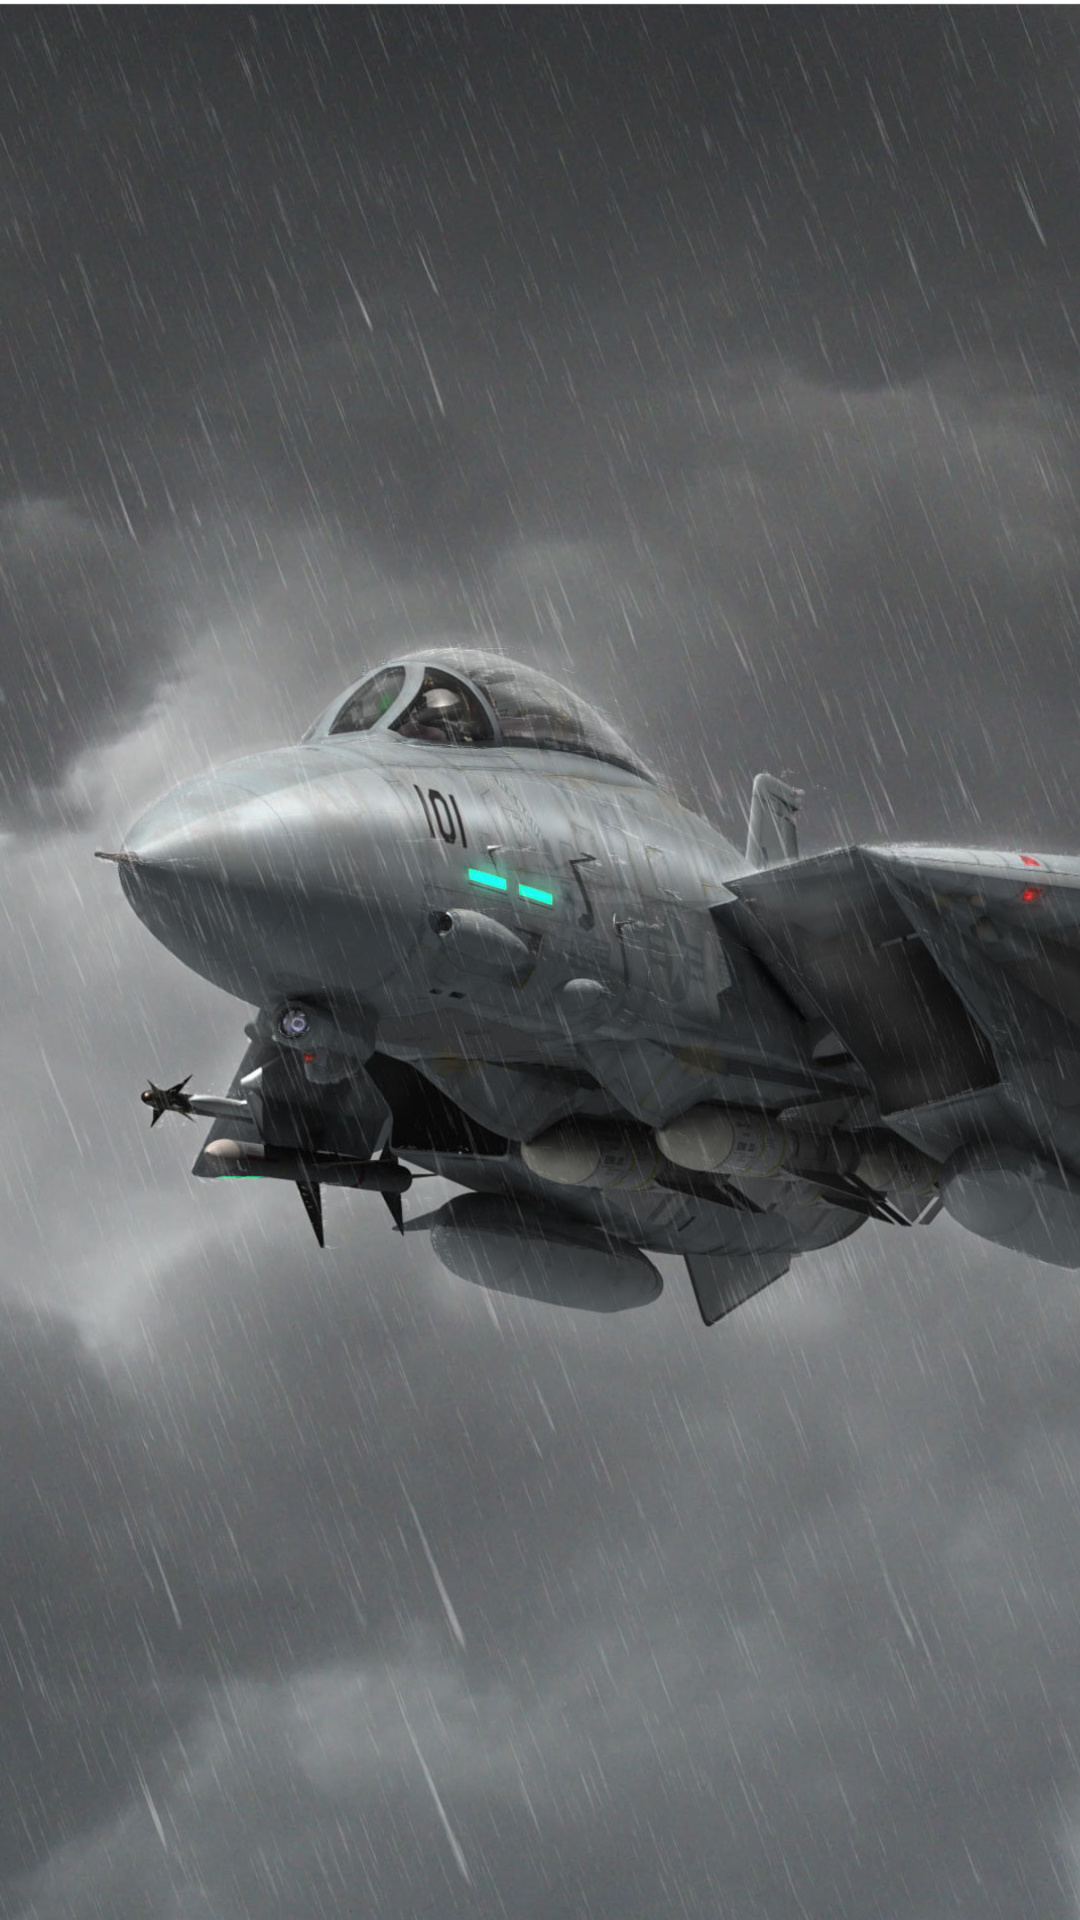 Grumman F 21 Tomcat Interceptor Wallpaper for iPhone 21 Plus